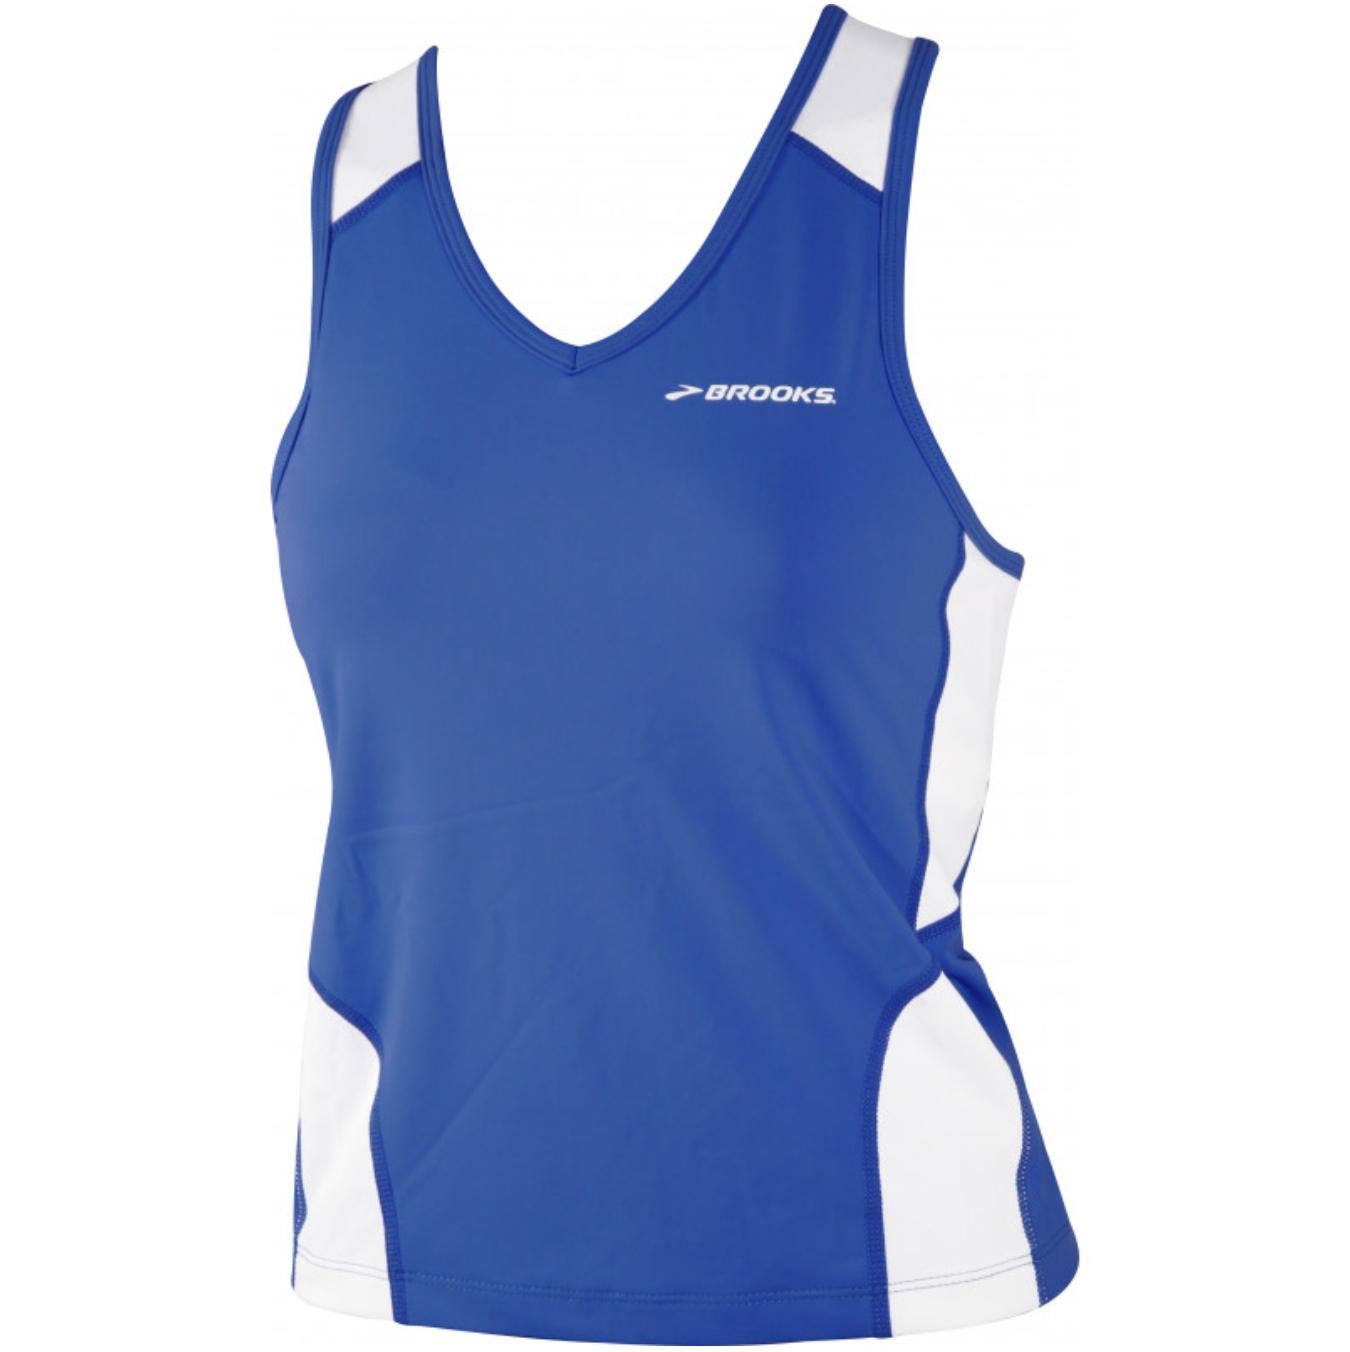 Brooks Mach IX Womens Running Vest Tank Top blue - £3 / £5.95 delivered ** sizes small &medium left @ Start Fitness